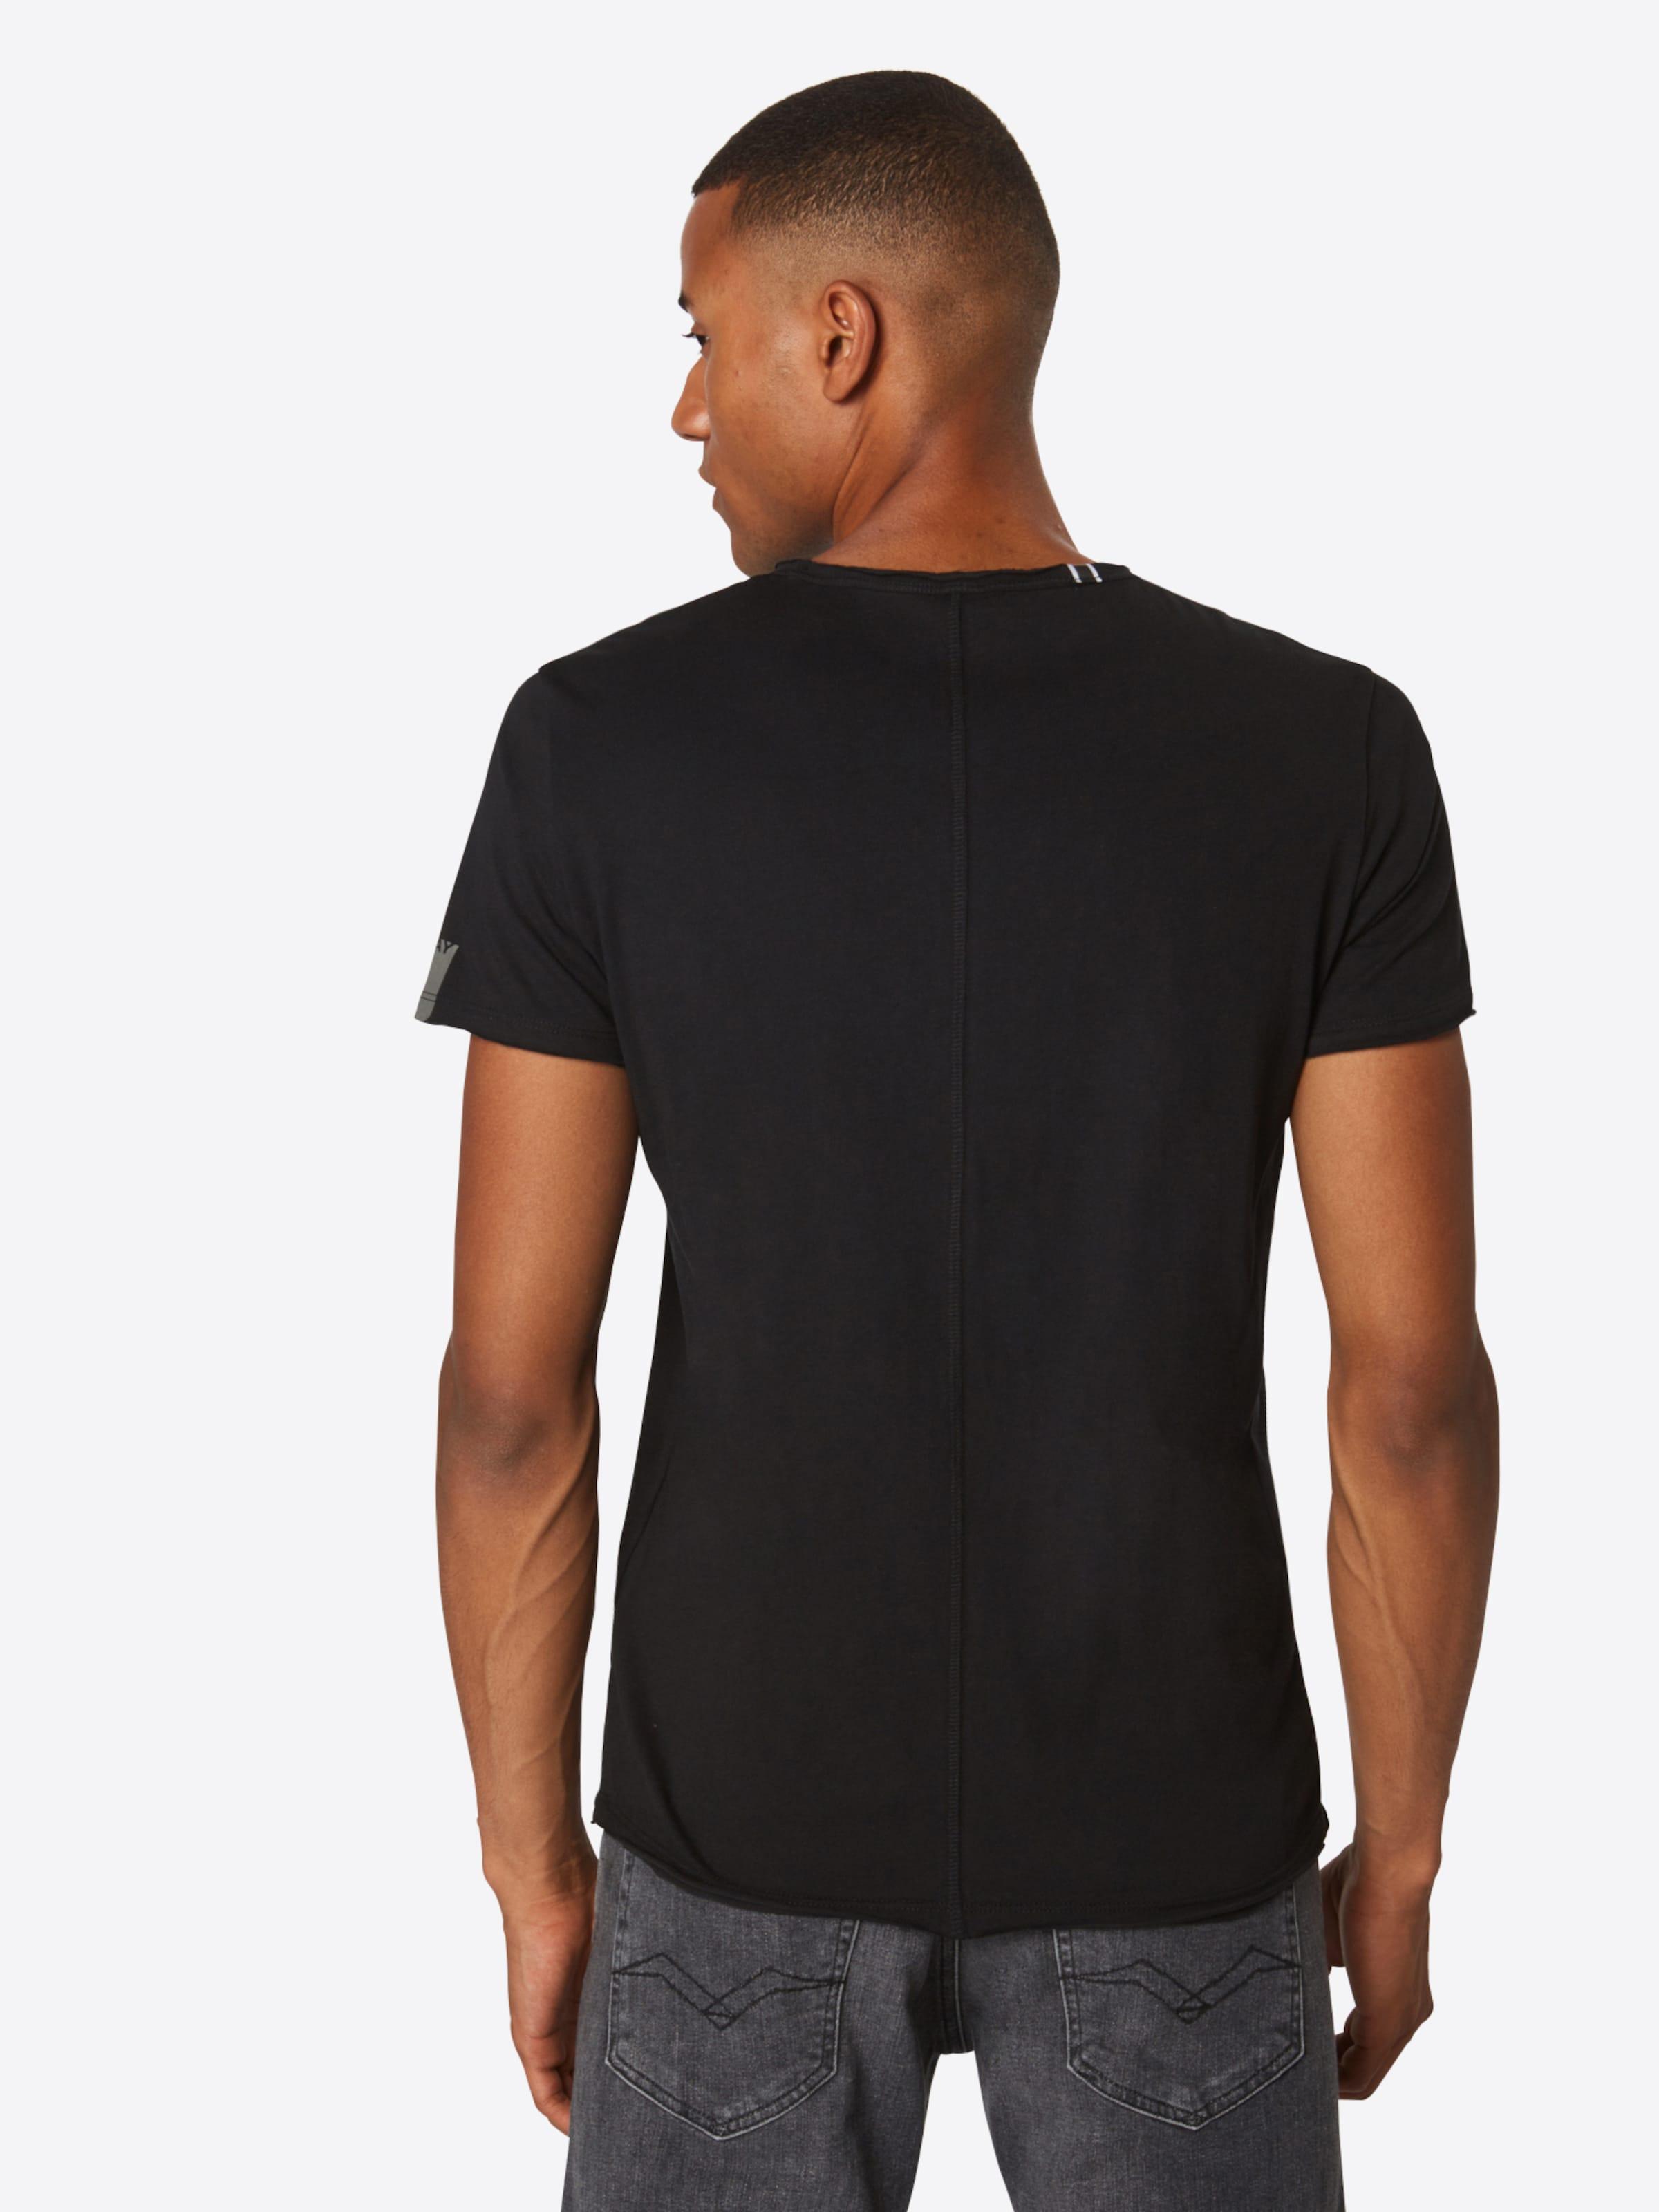 T Replay T Noir Replay En shirt J3K1lcTF